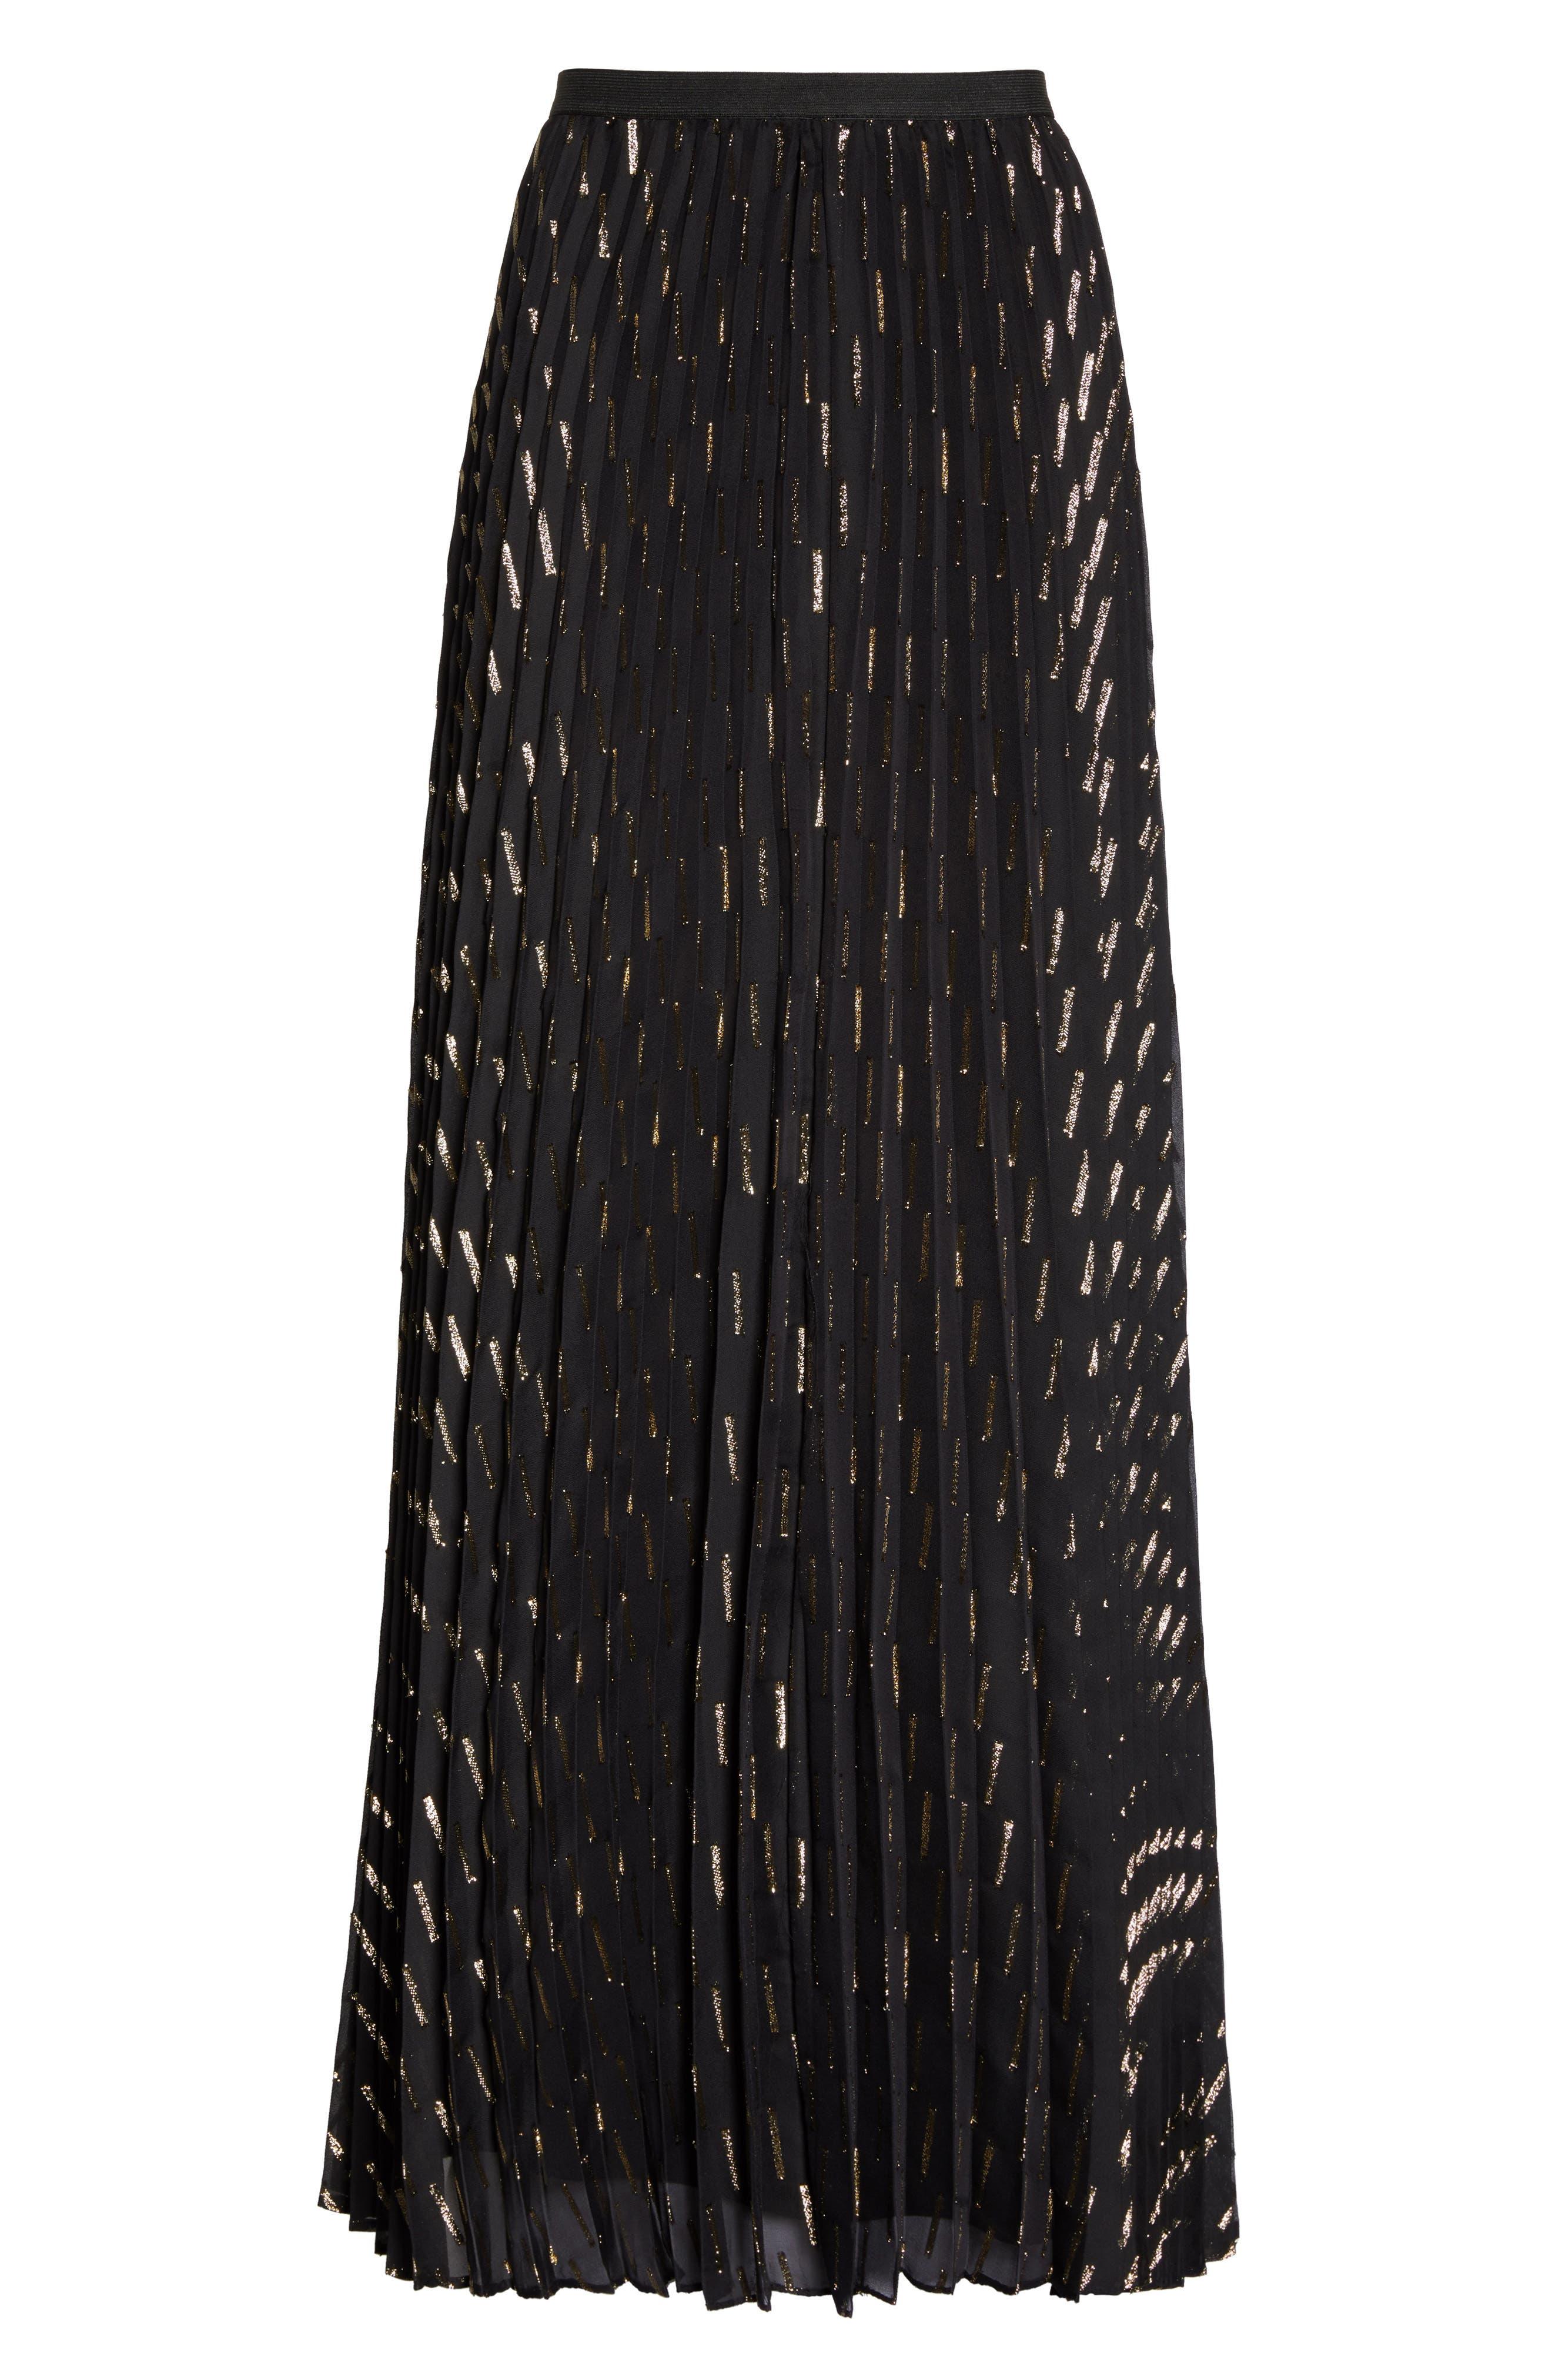 Metallic Detail Pleated Chiffon Maxi Skirt,                             Alternate thumbnail 8, color,                             Black Gold